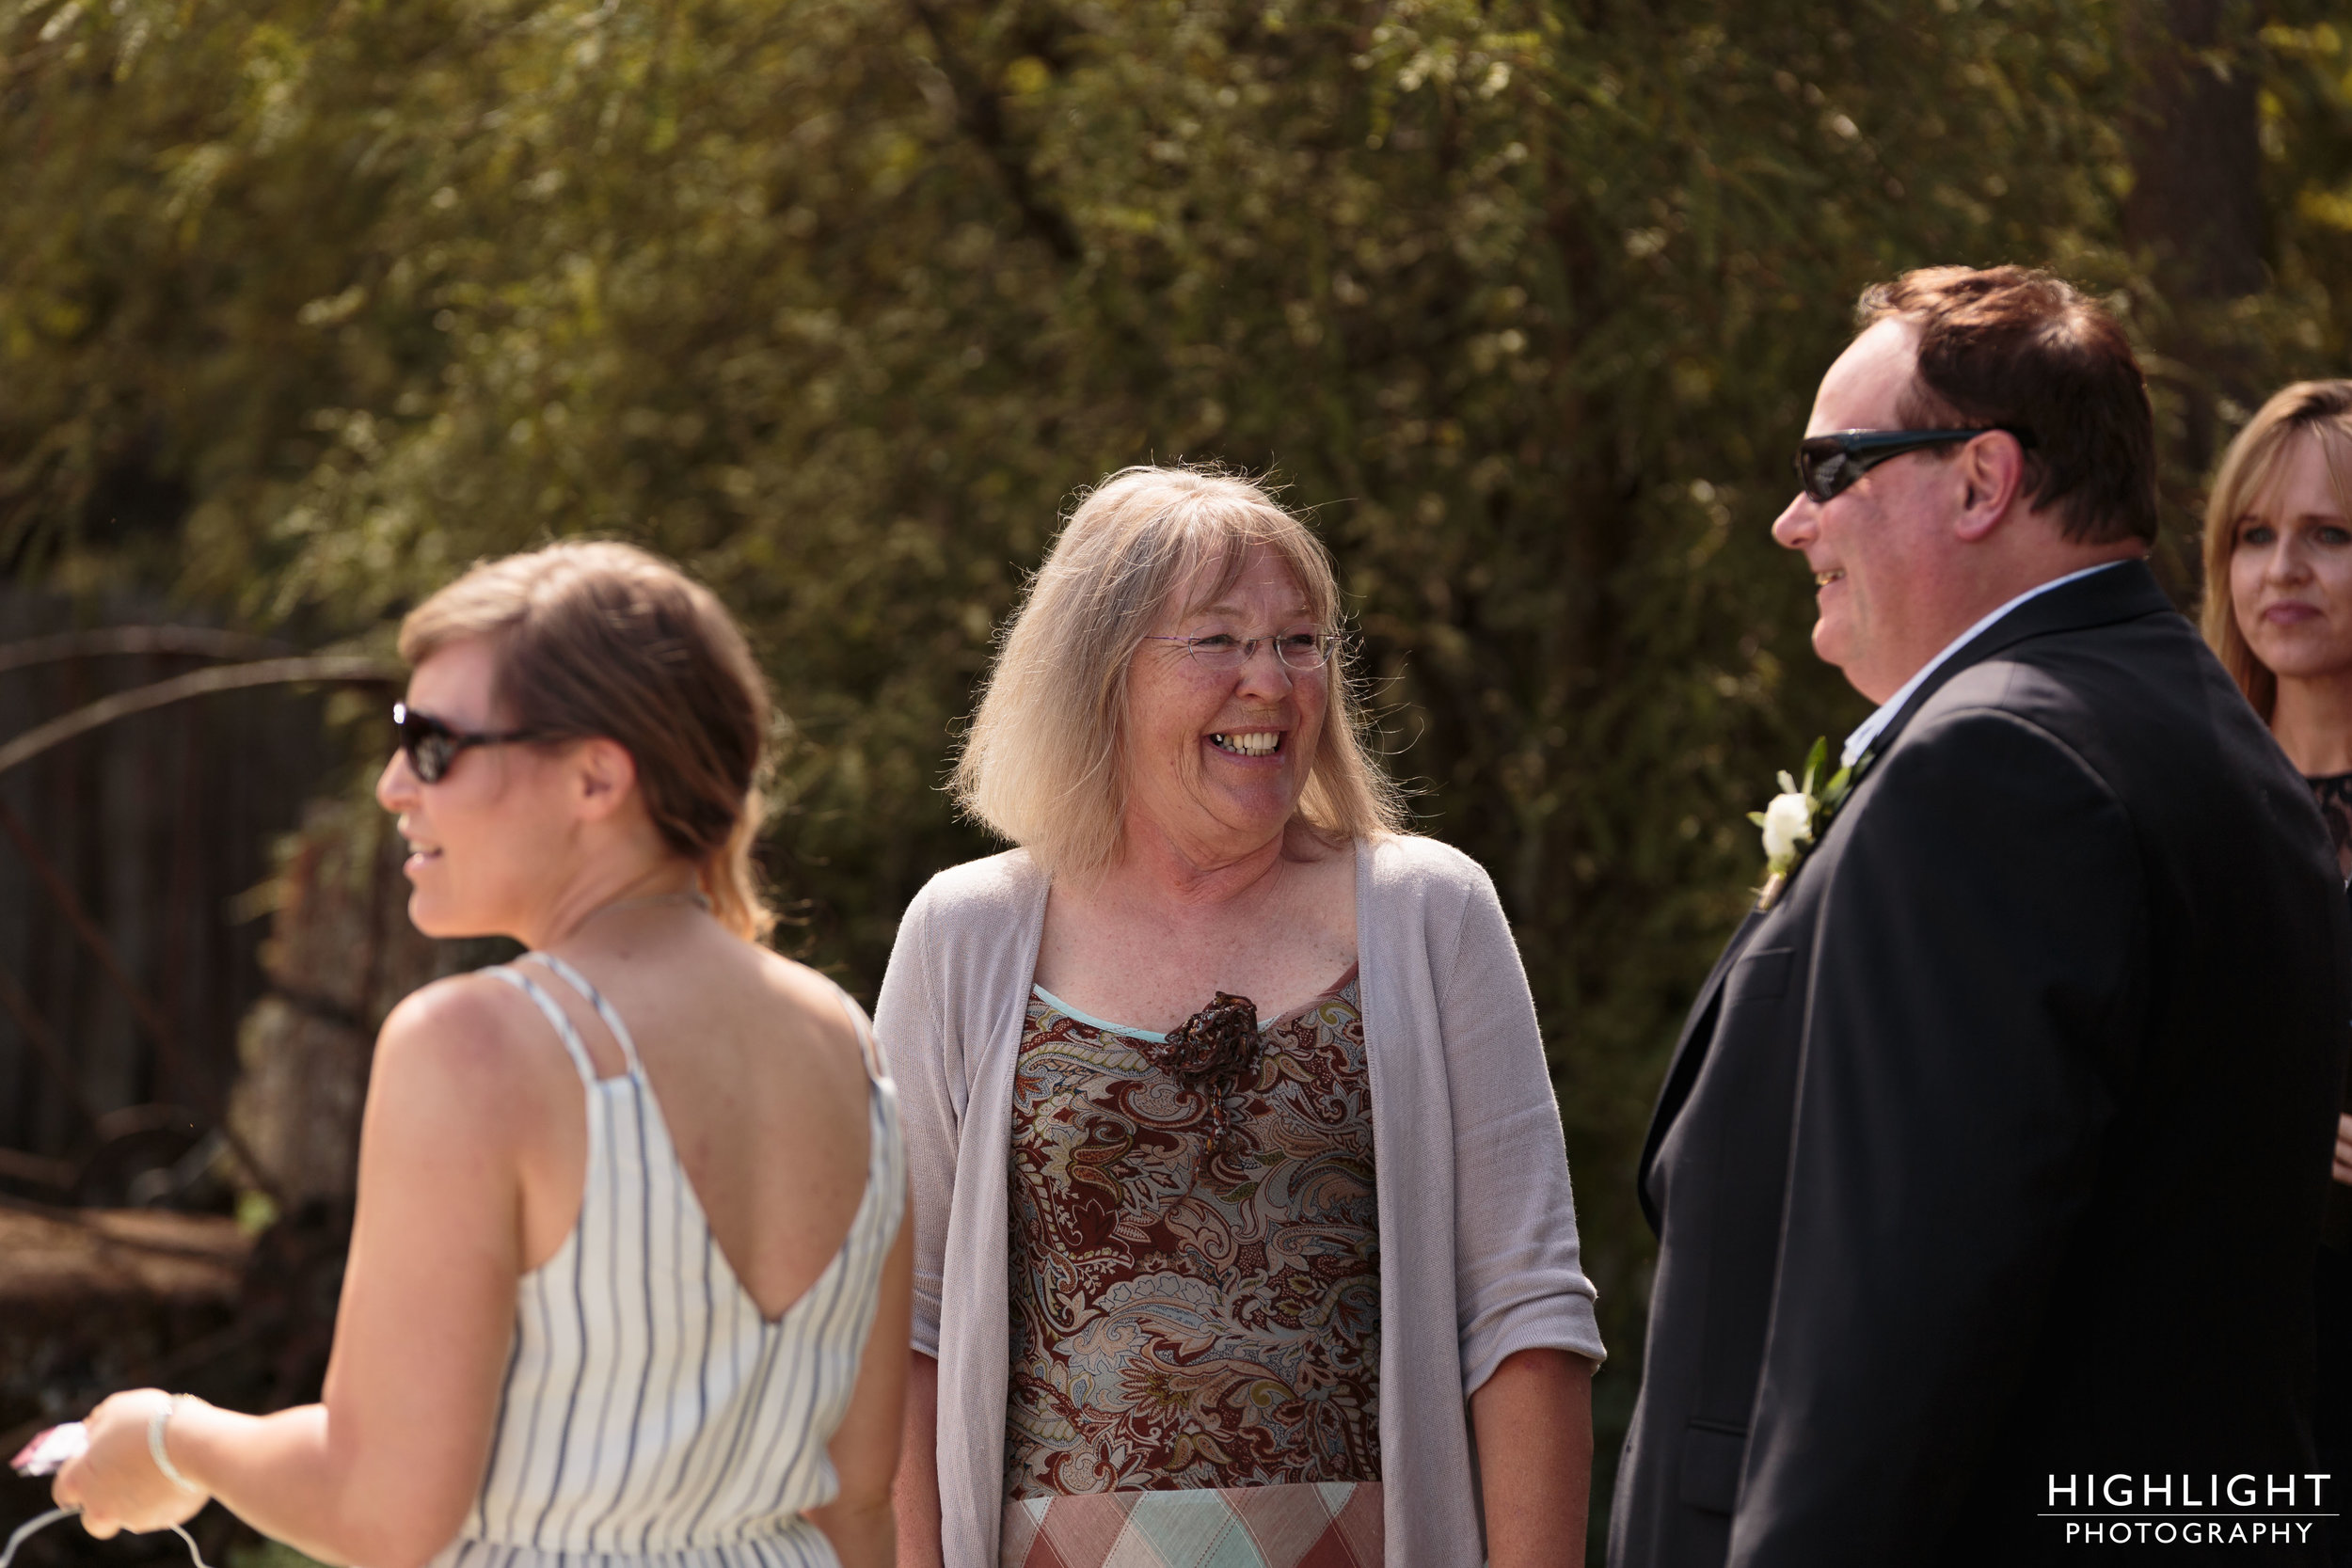 highlight-wedding-photography-new-zealand-makoura-lodge-wedding-42.jpg